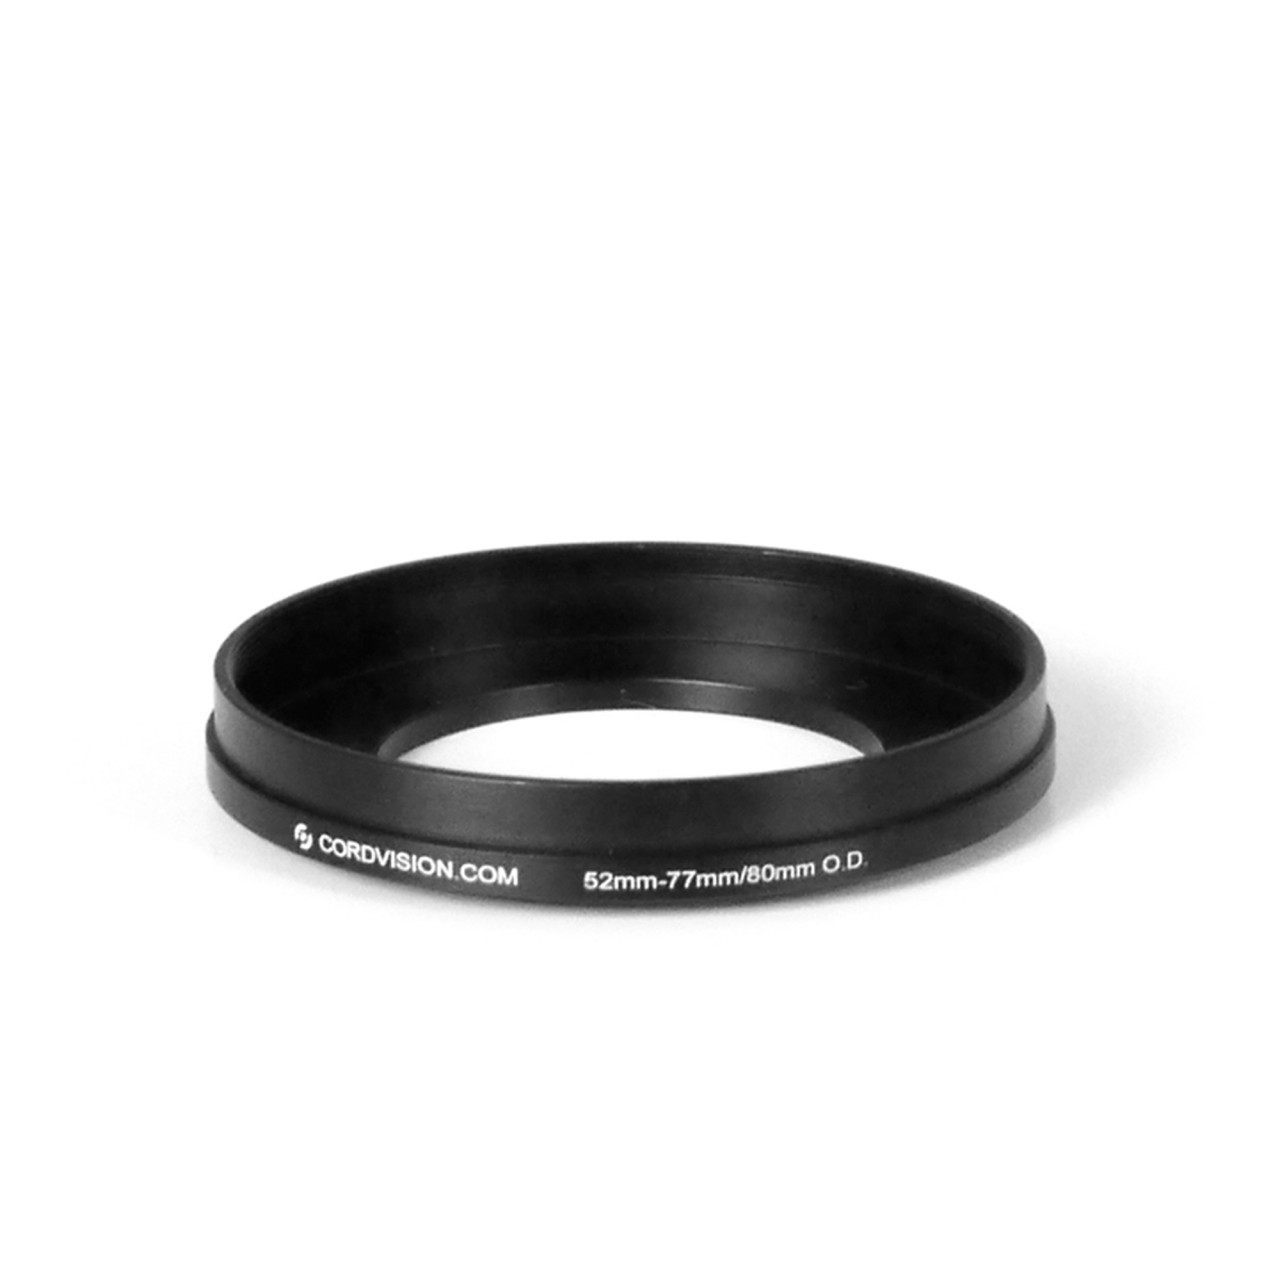 52mm cine ring 80mm o d cordvision com quality filmmaking